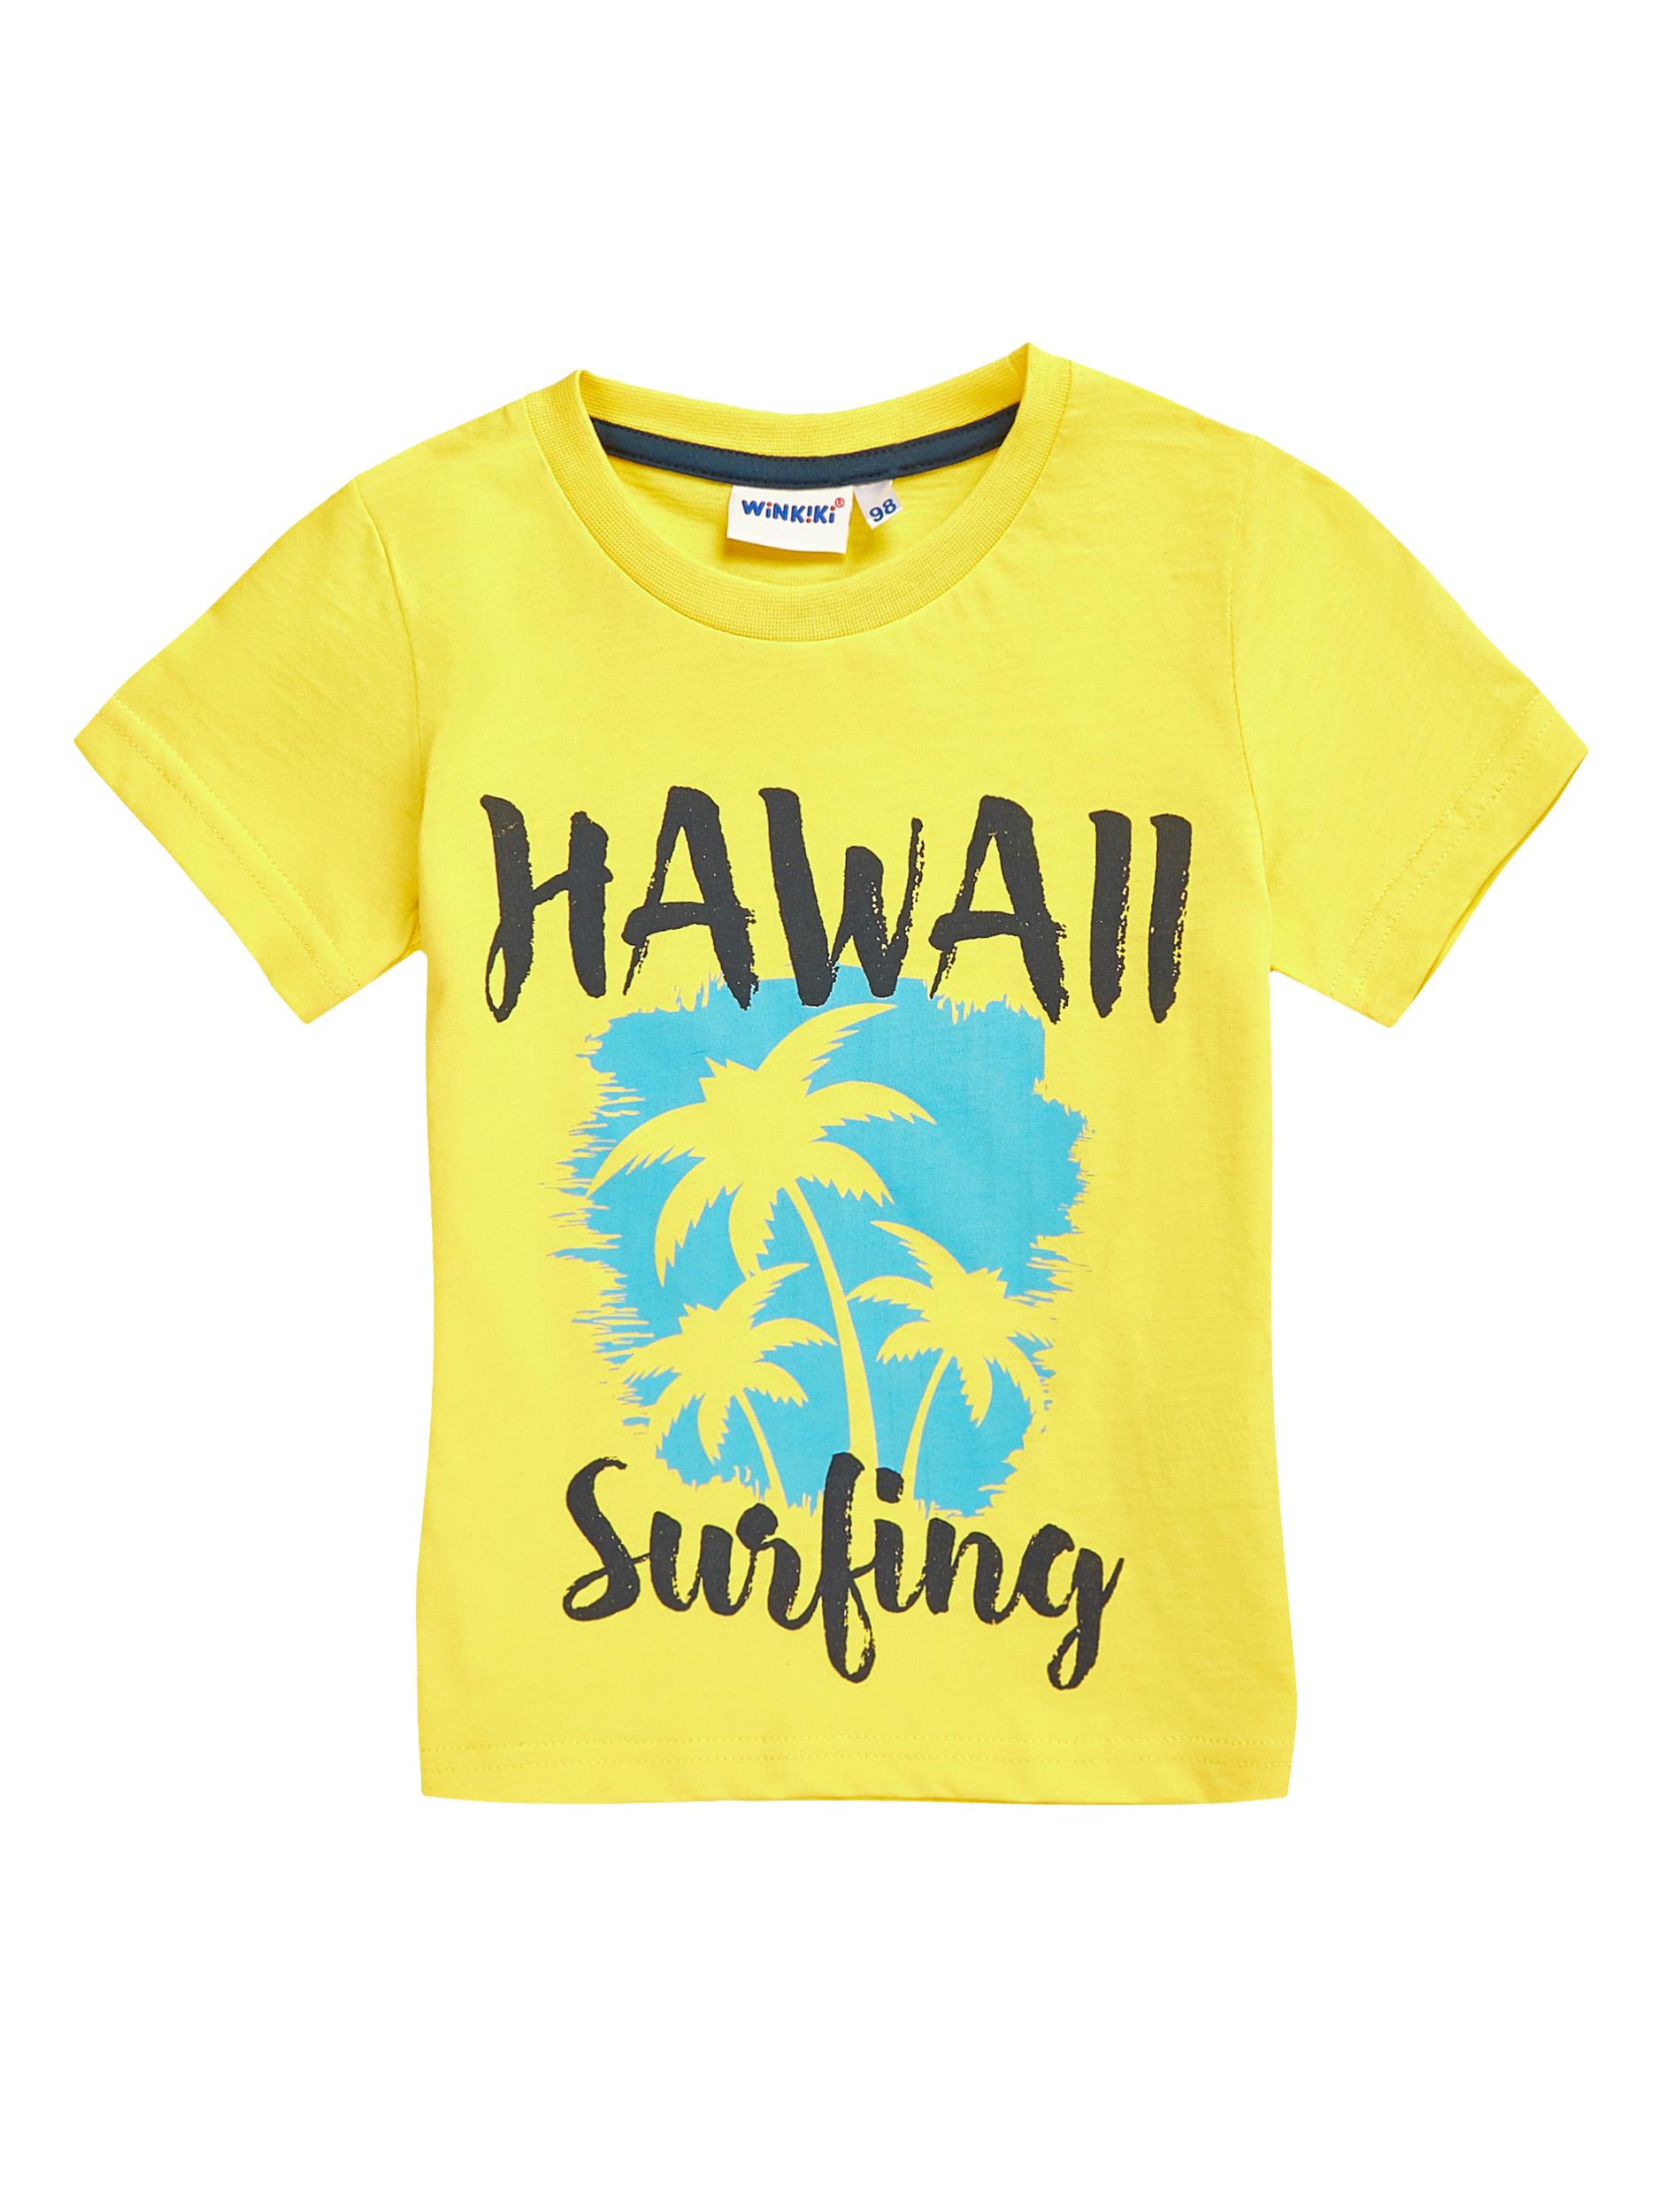 Chlapecké tričko Hawaii - žluté Žlutá